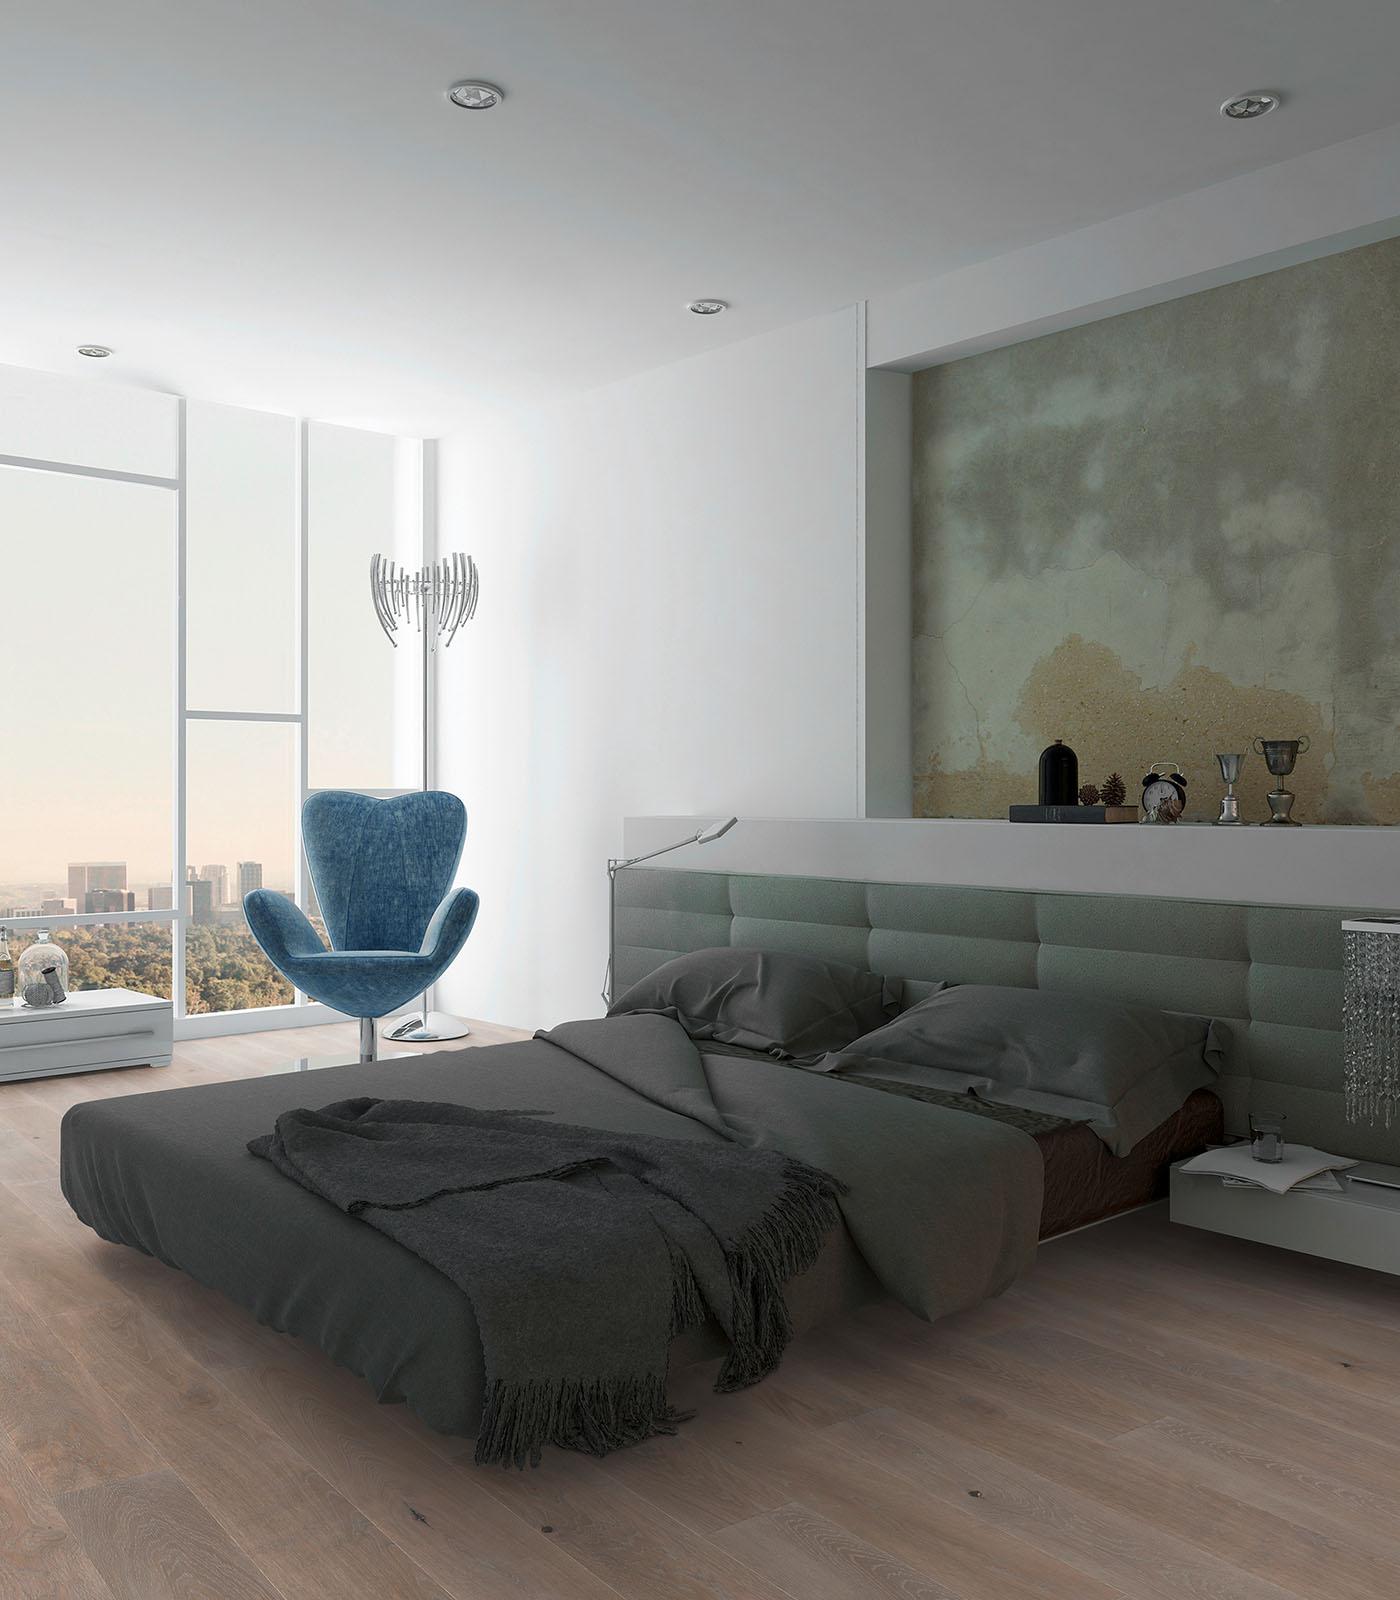 PISOS DO BRASIL - PISOS MADERA - FLOOR ART -Grigio-Sabia-Room.jpg